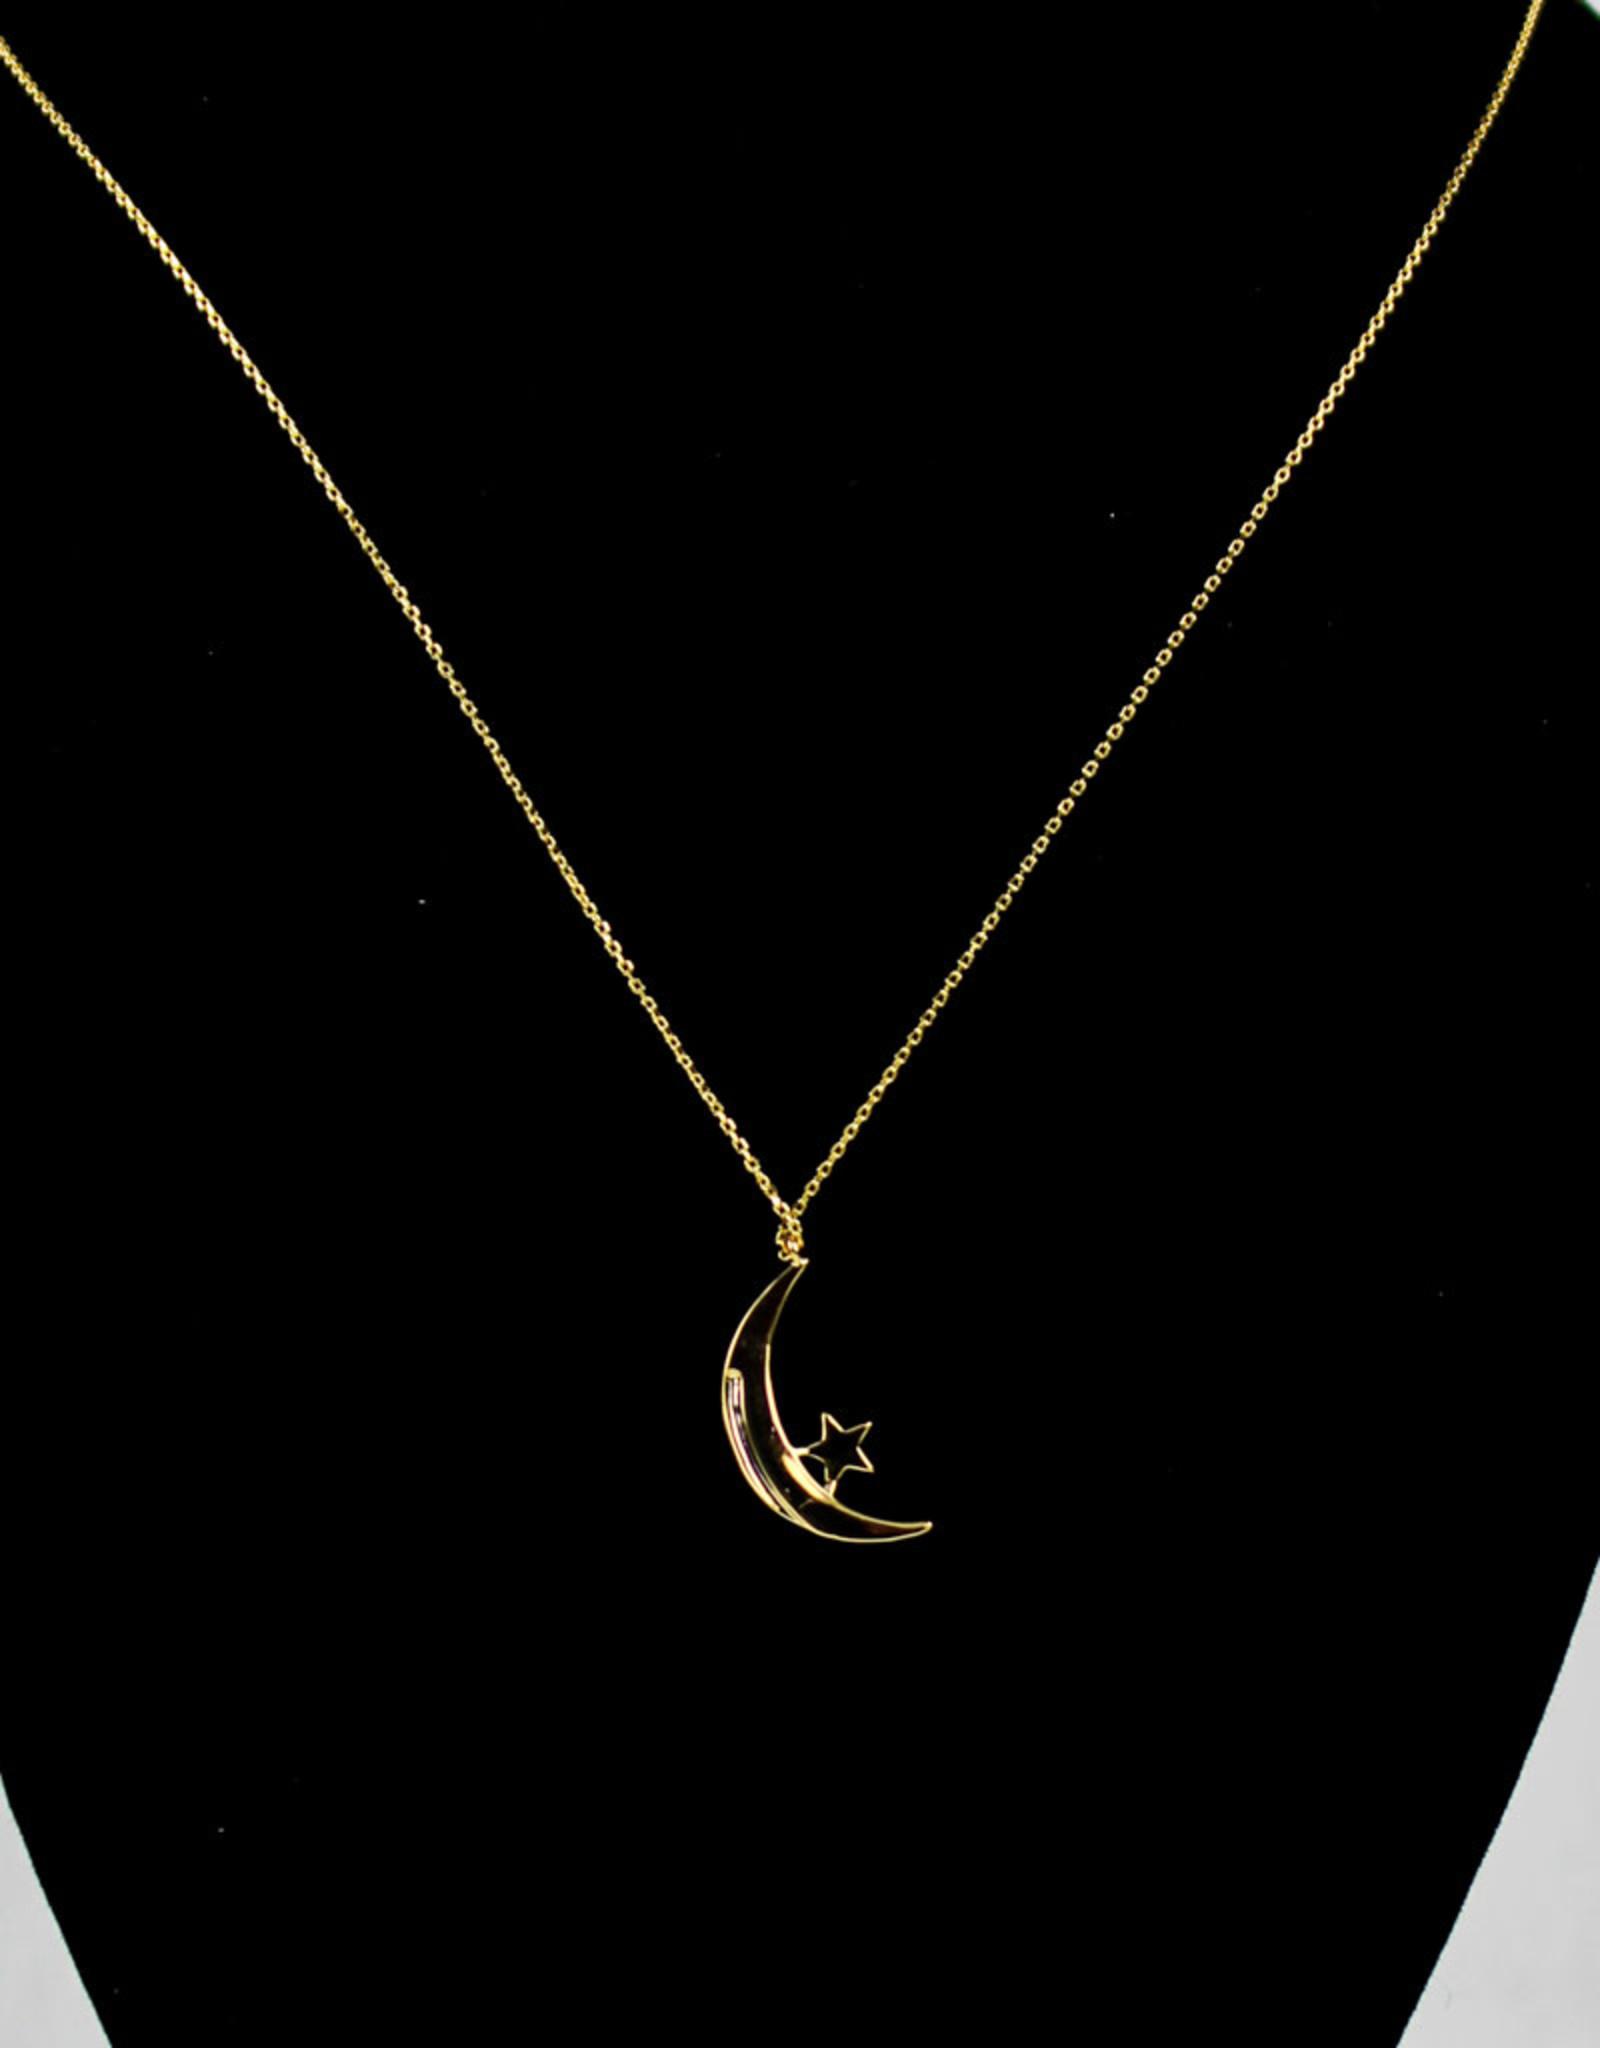 Mesa Blue Celestial Moon & Star Necklace